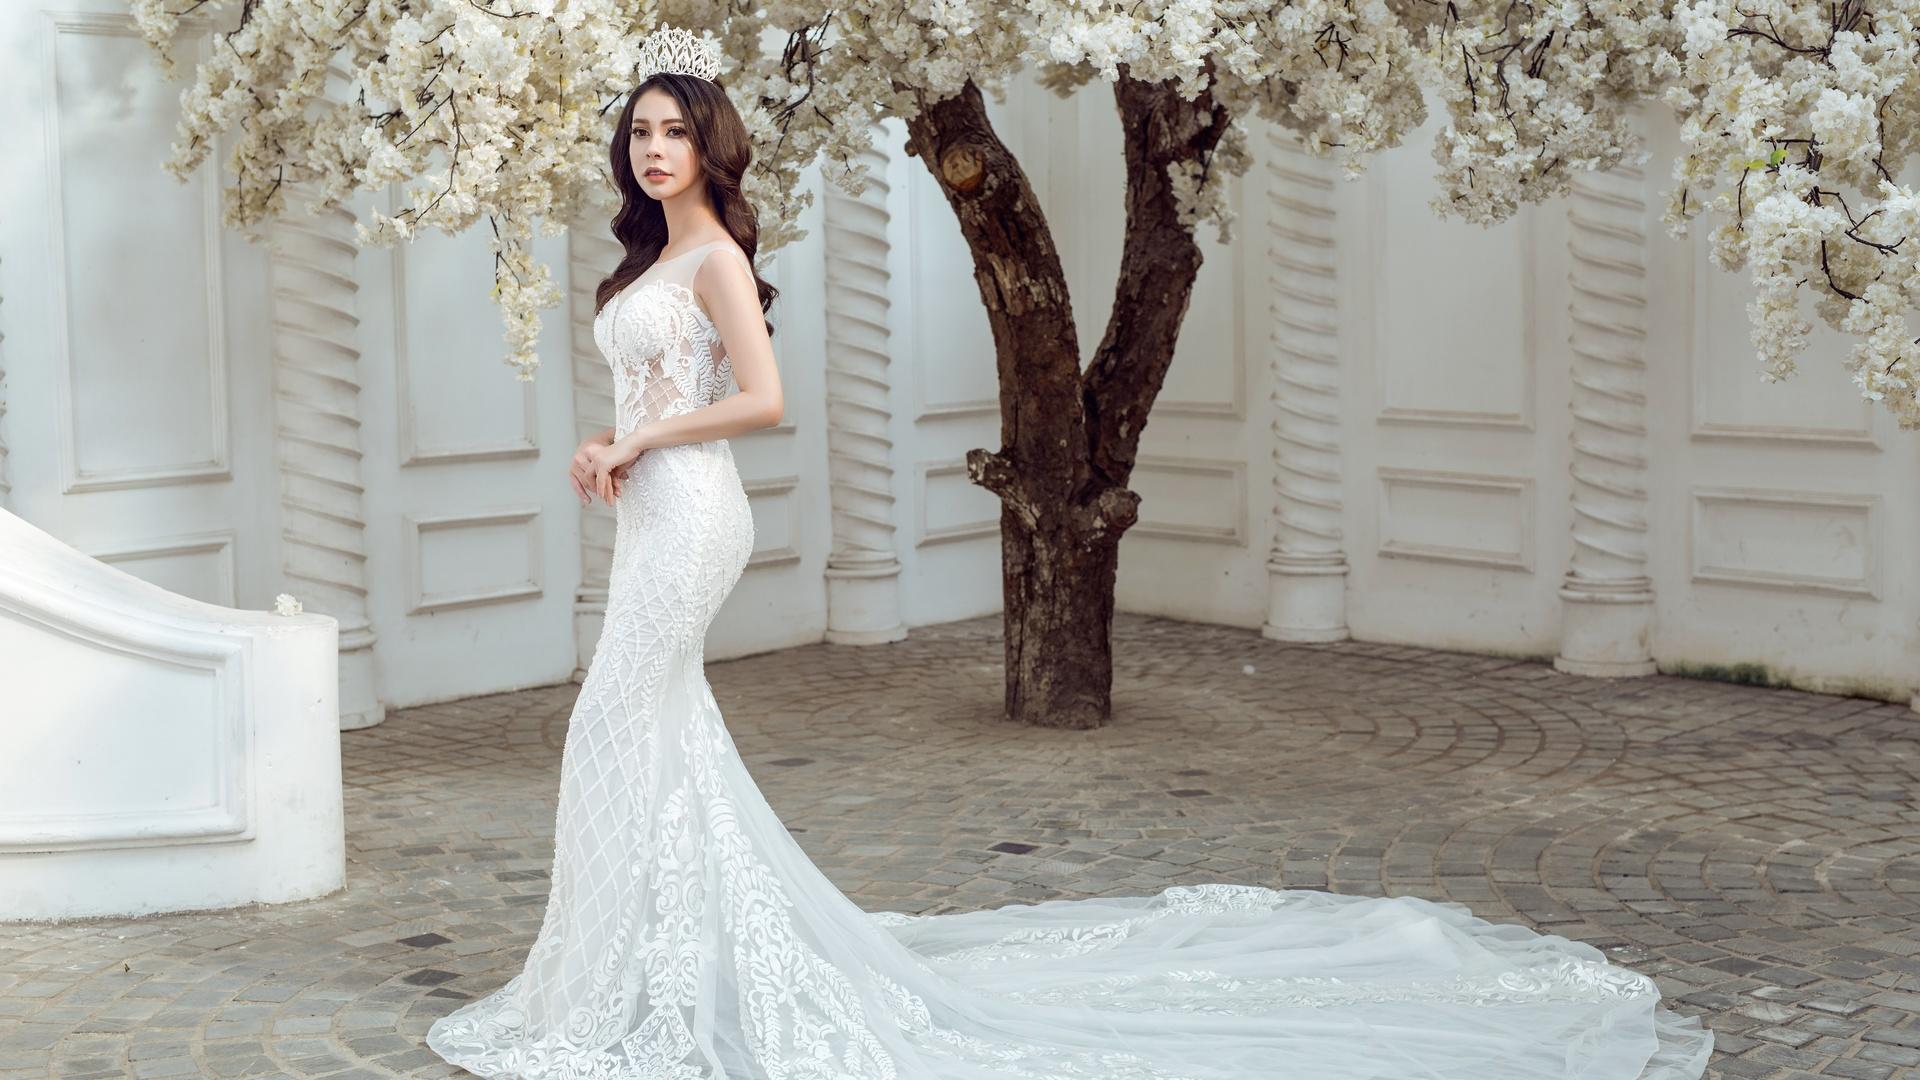 1920x1080 Bride Wedding Dress White Dress Laptop Full HD